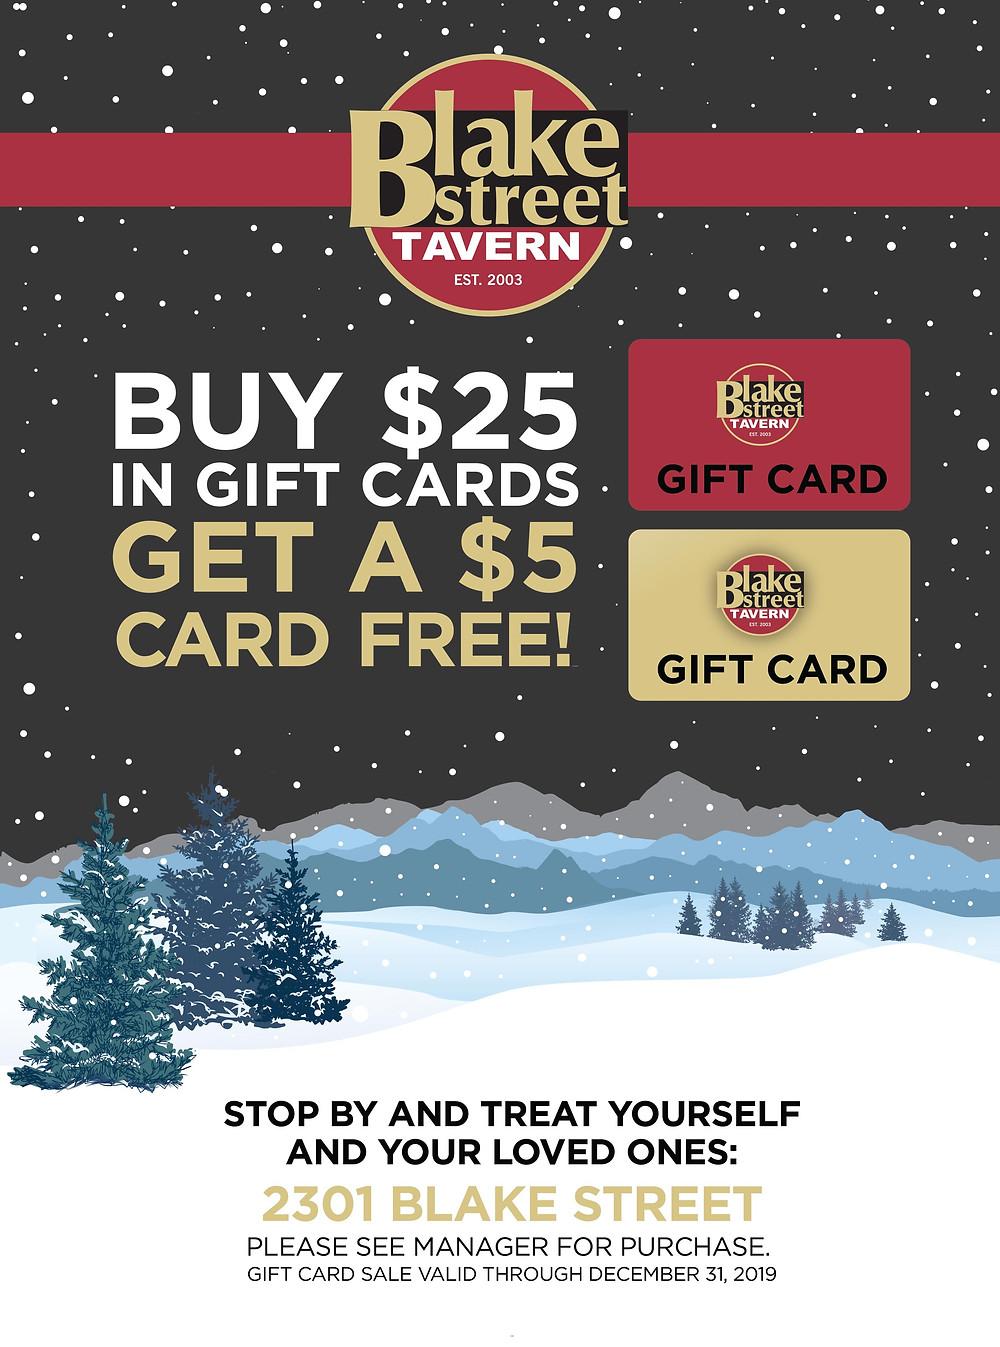 Denver Restaurant Gift Cards - Deal!